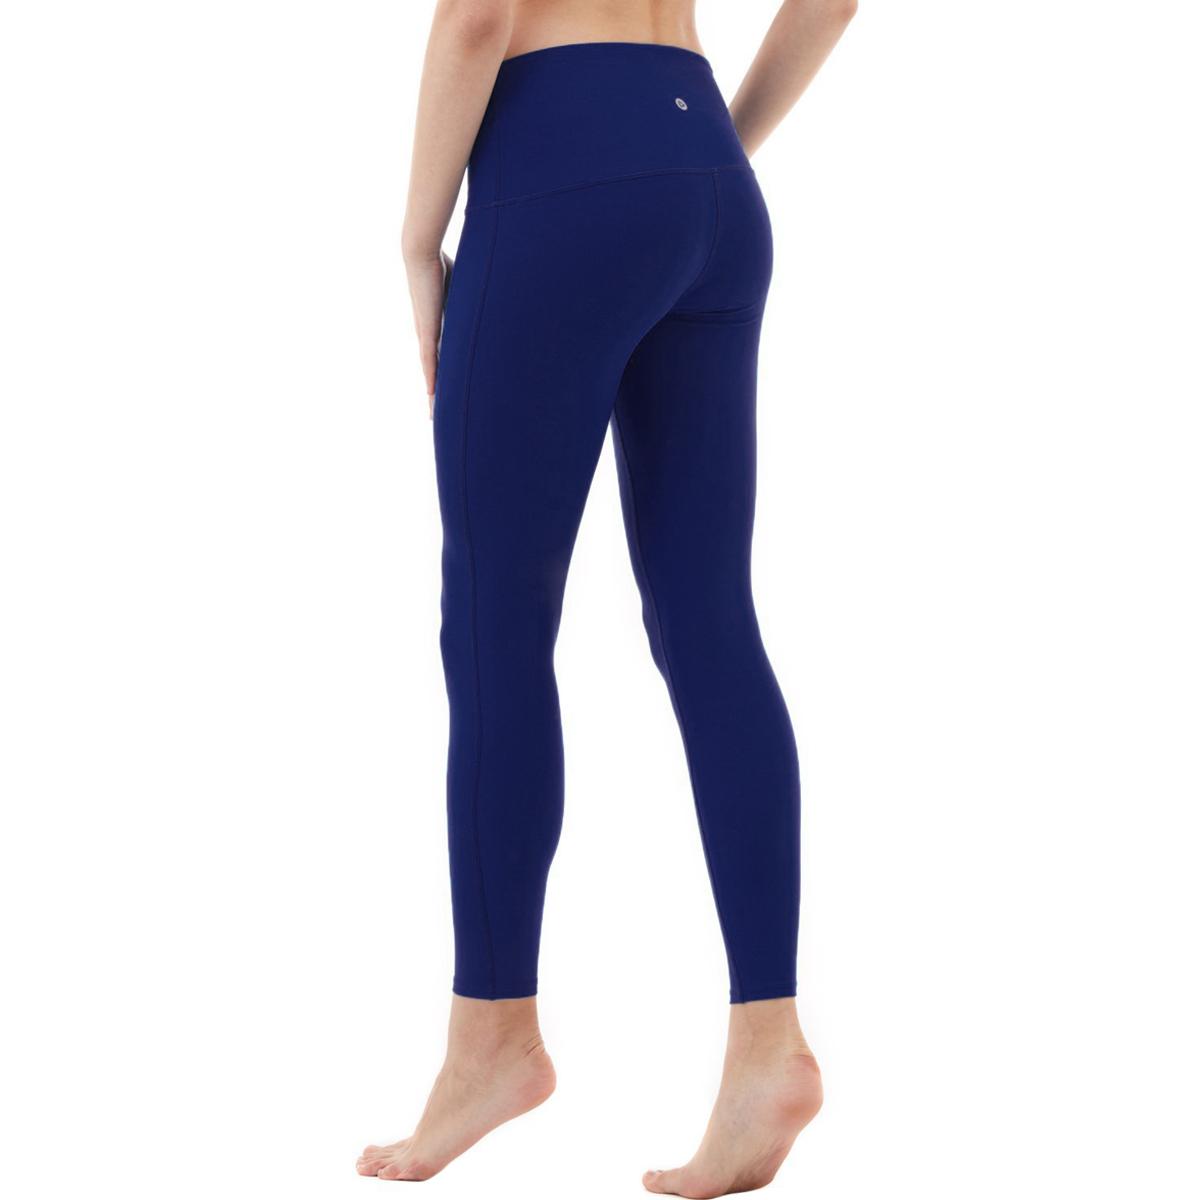 thumbnail 26 - TSLA Tesla FYP42 Women's High-Waisted Ultra-Stretch Tummy Control Yoga Pants